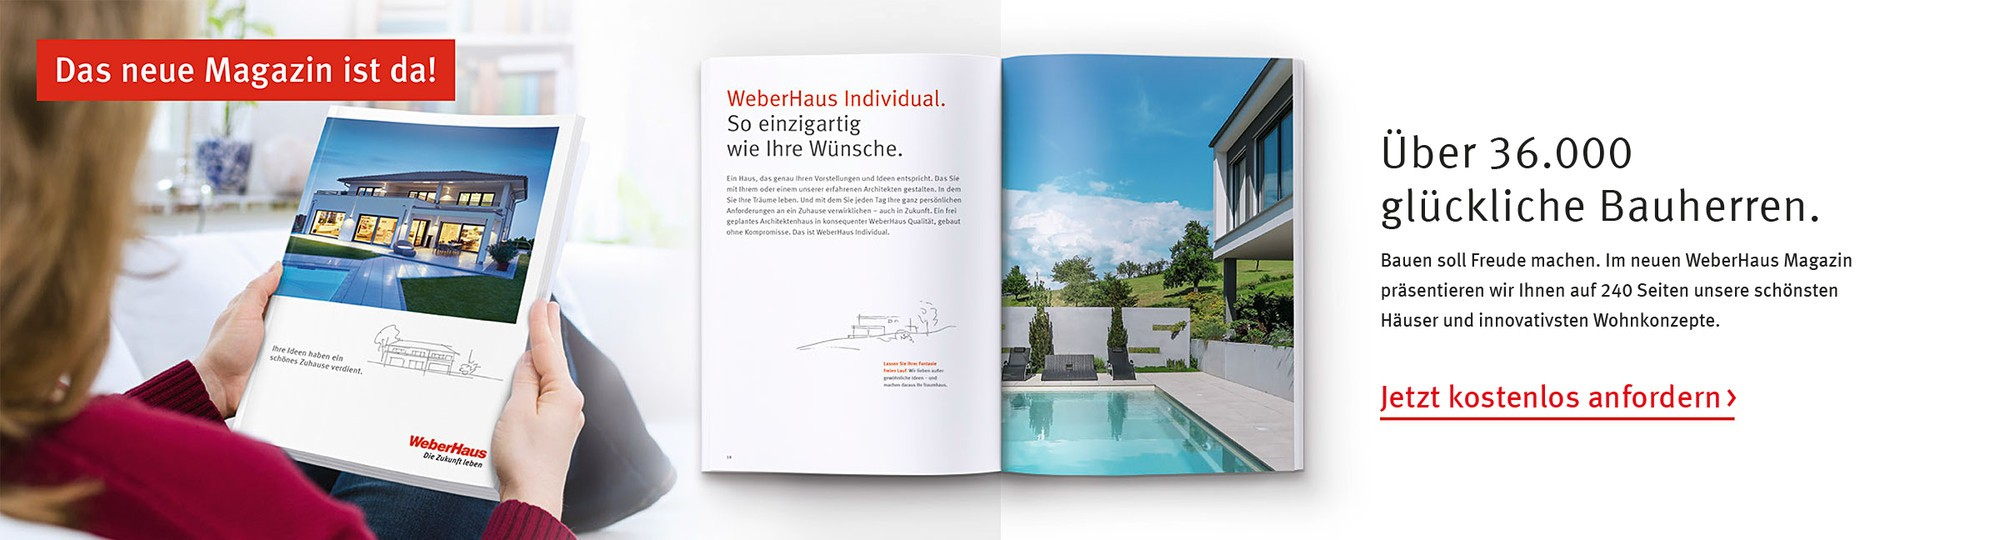 Fertighaus: WeberHaus ☆ Deutscher Traumhauspreis 2018